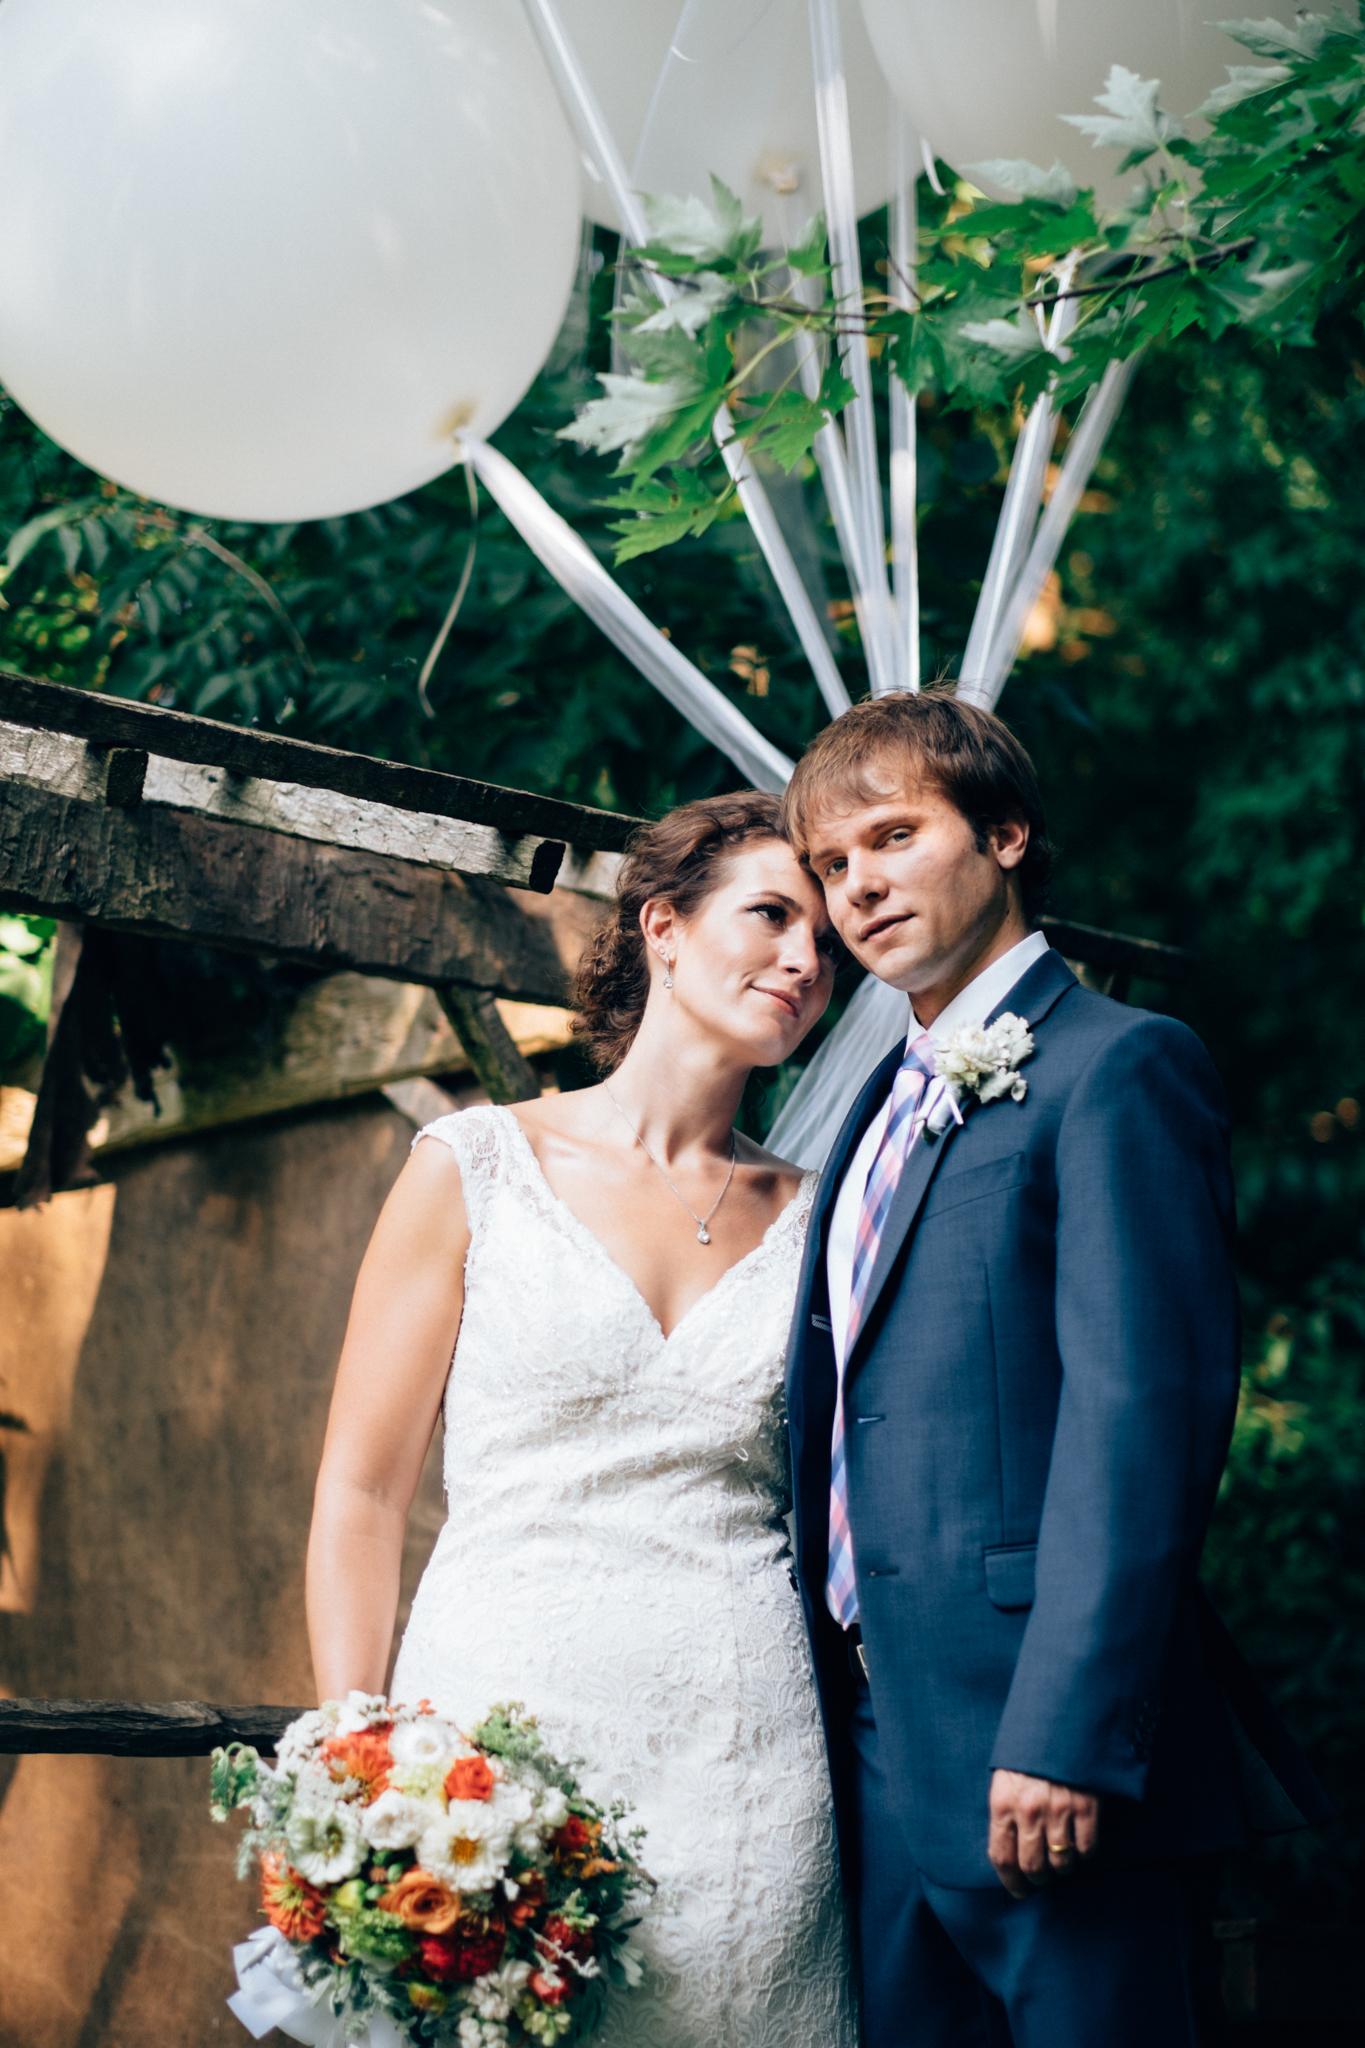 Allie&Brenton_Wedding_0077.jpg